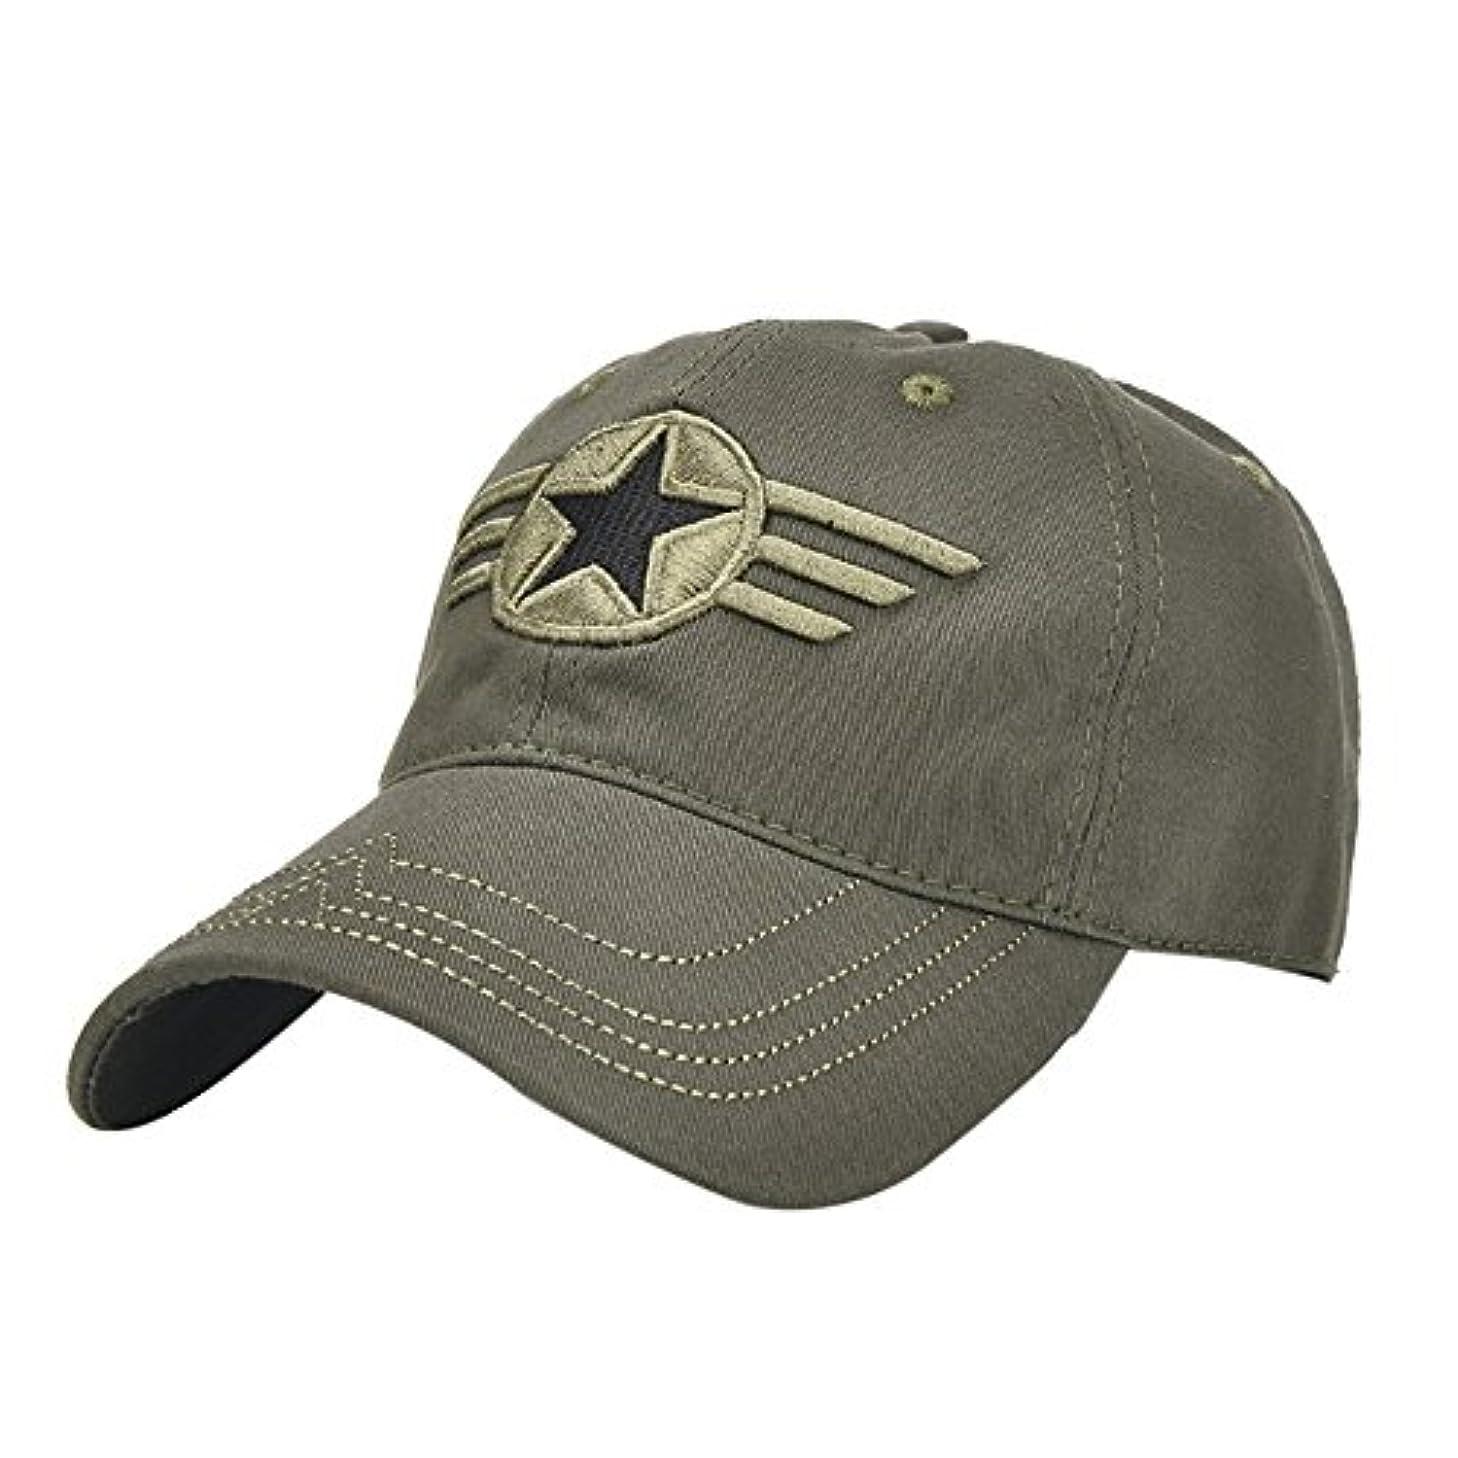 Racazing Cap ミリタリーキャップ 野球帽 迷彩 夏 登山 通気性のある メッシュ 帽子 ベルクロ 可調整可能 スターバッジ 刺繍 棒球帽 UV 帽子 軽量 屋外 Unisex Hat (アーミーグリーン)